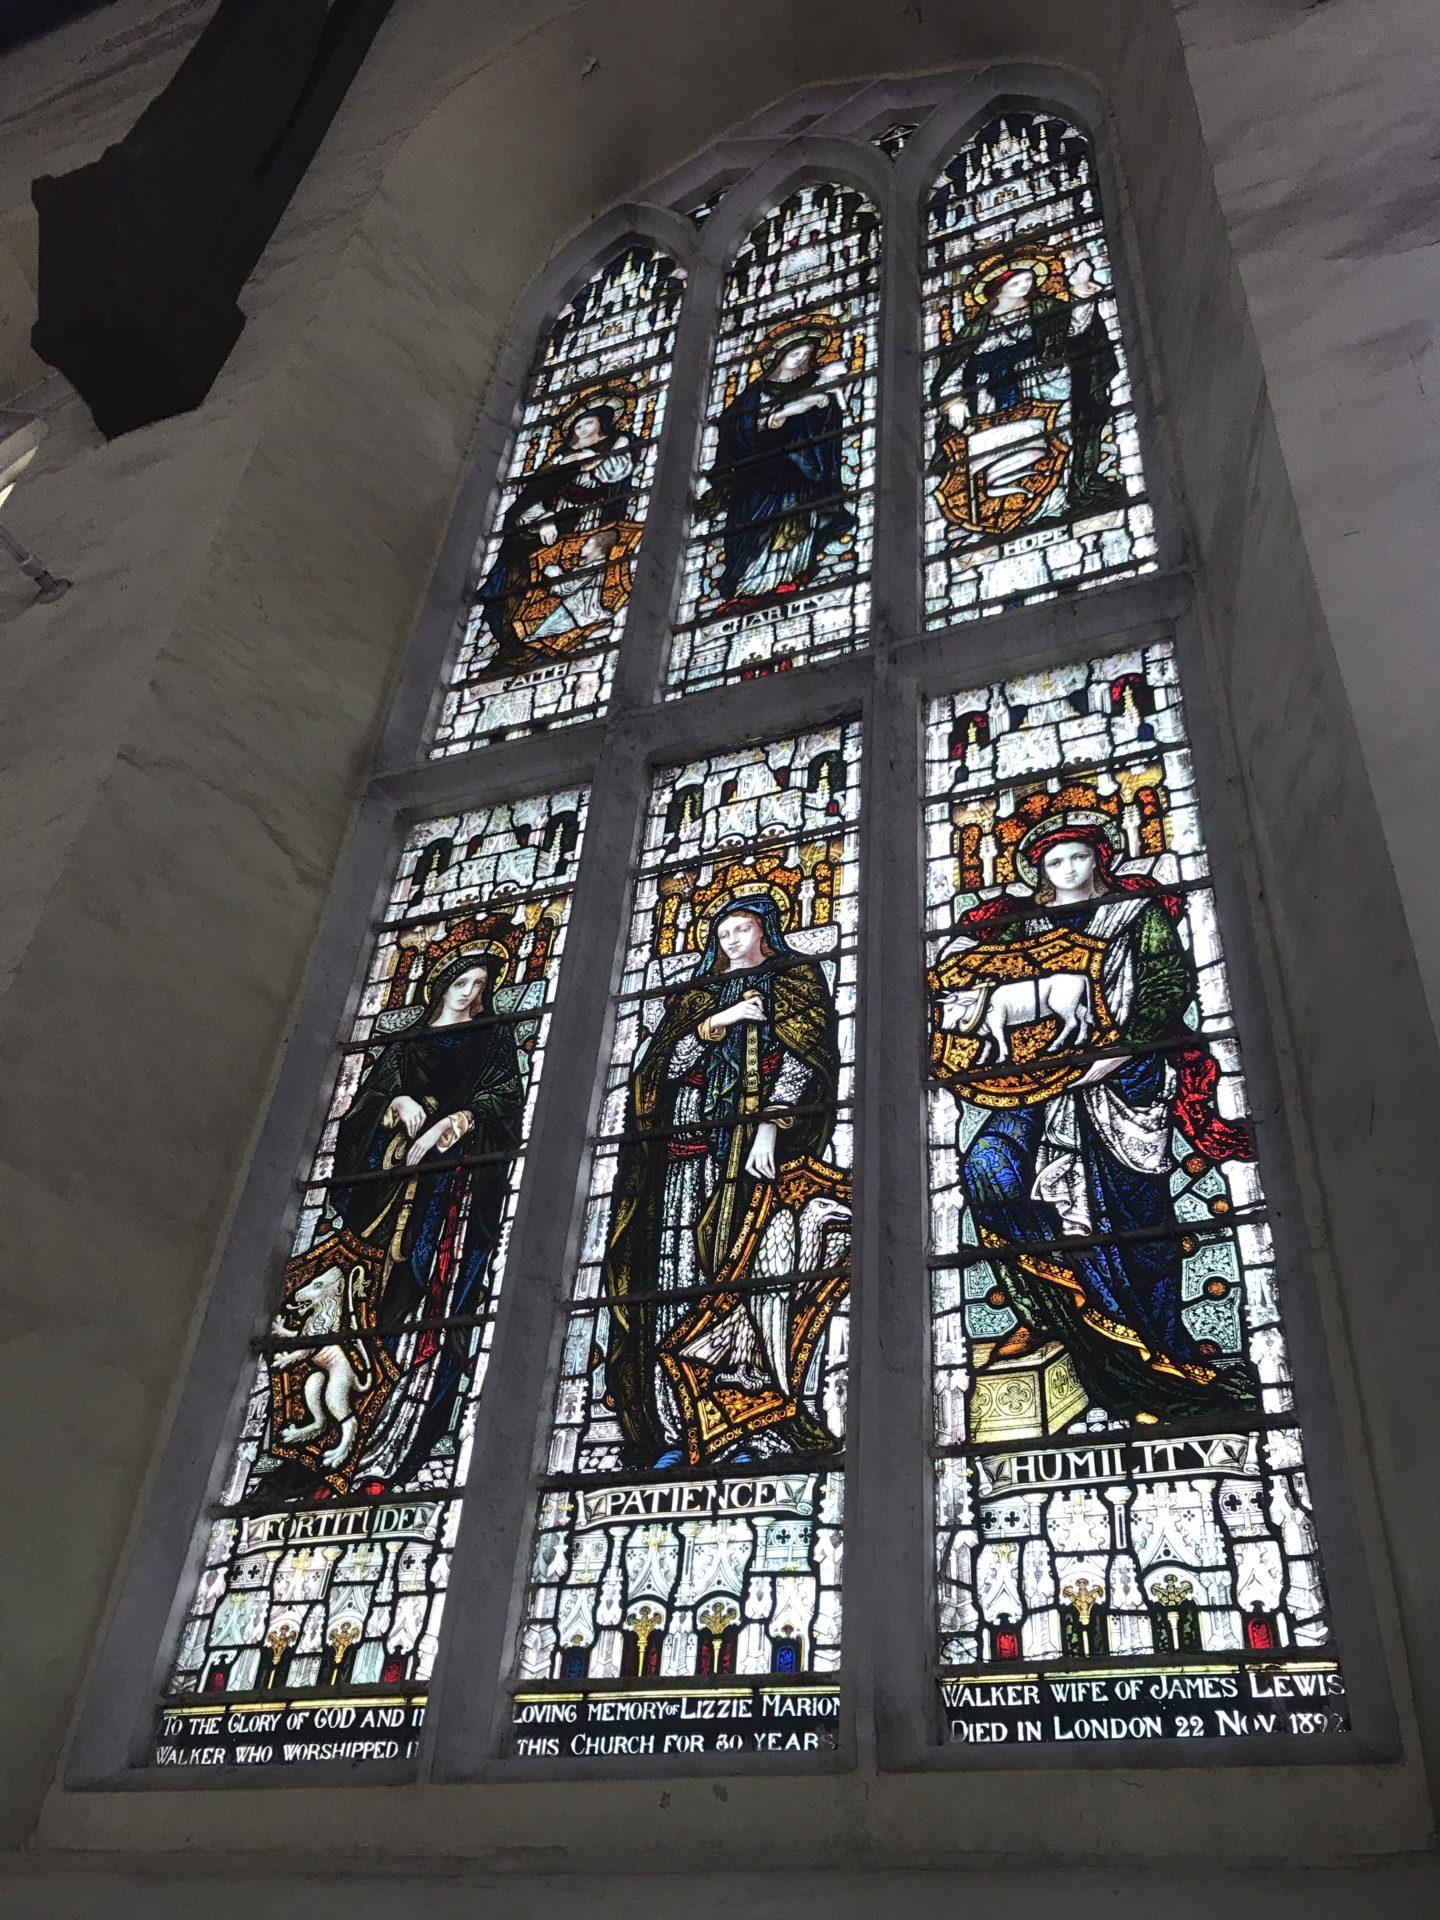 Christ church windows